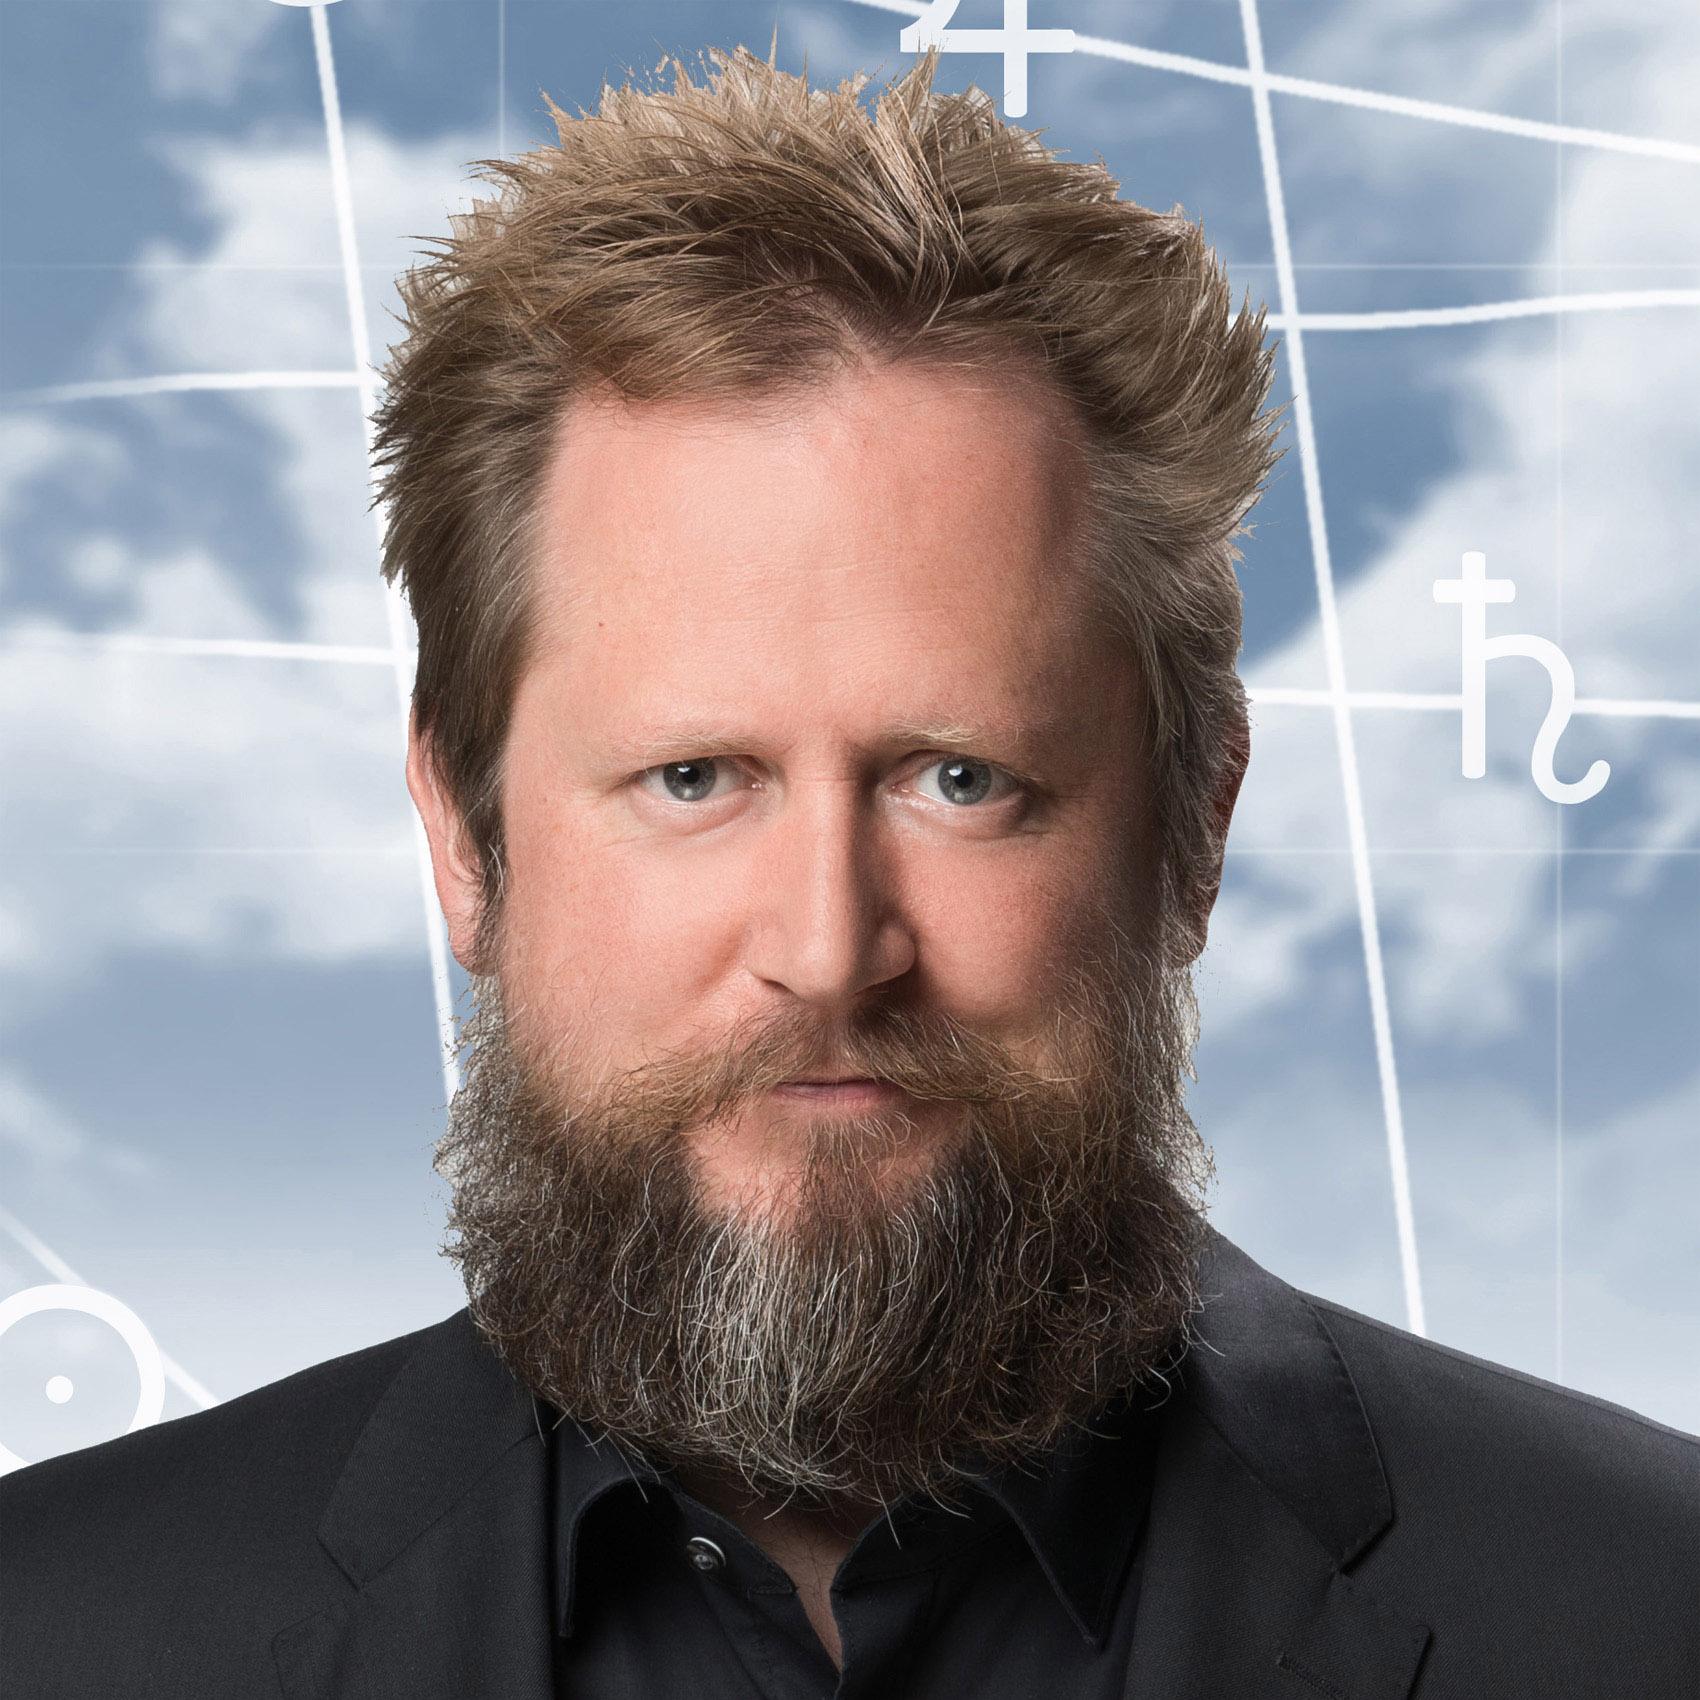 Dr. Christof Niederwieser